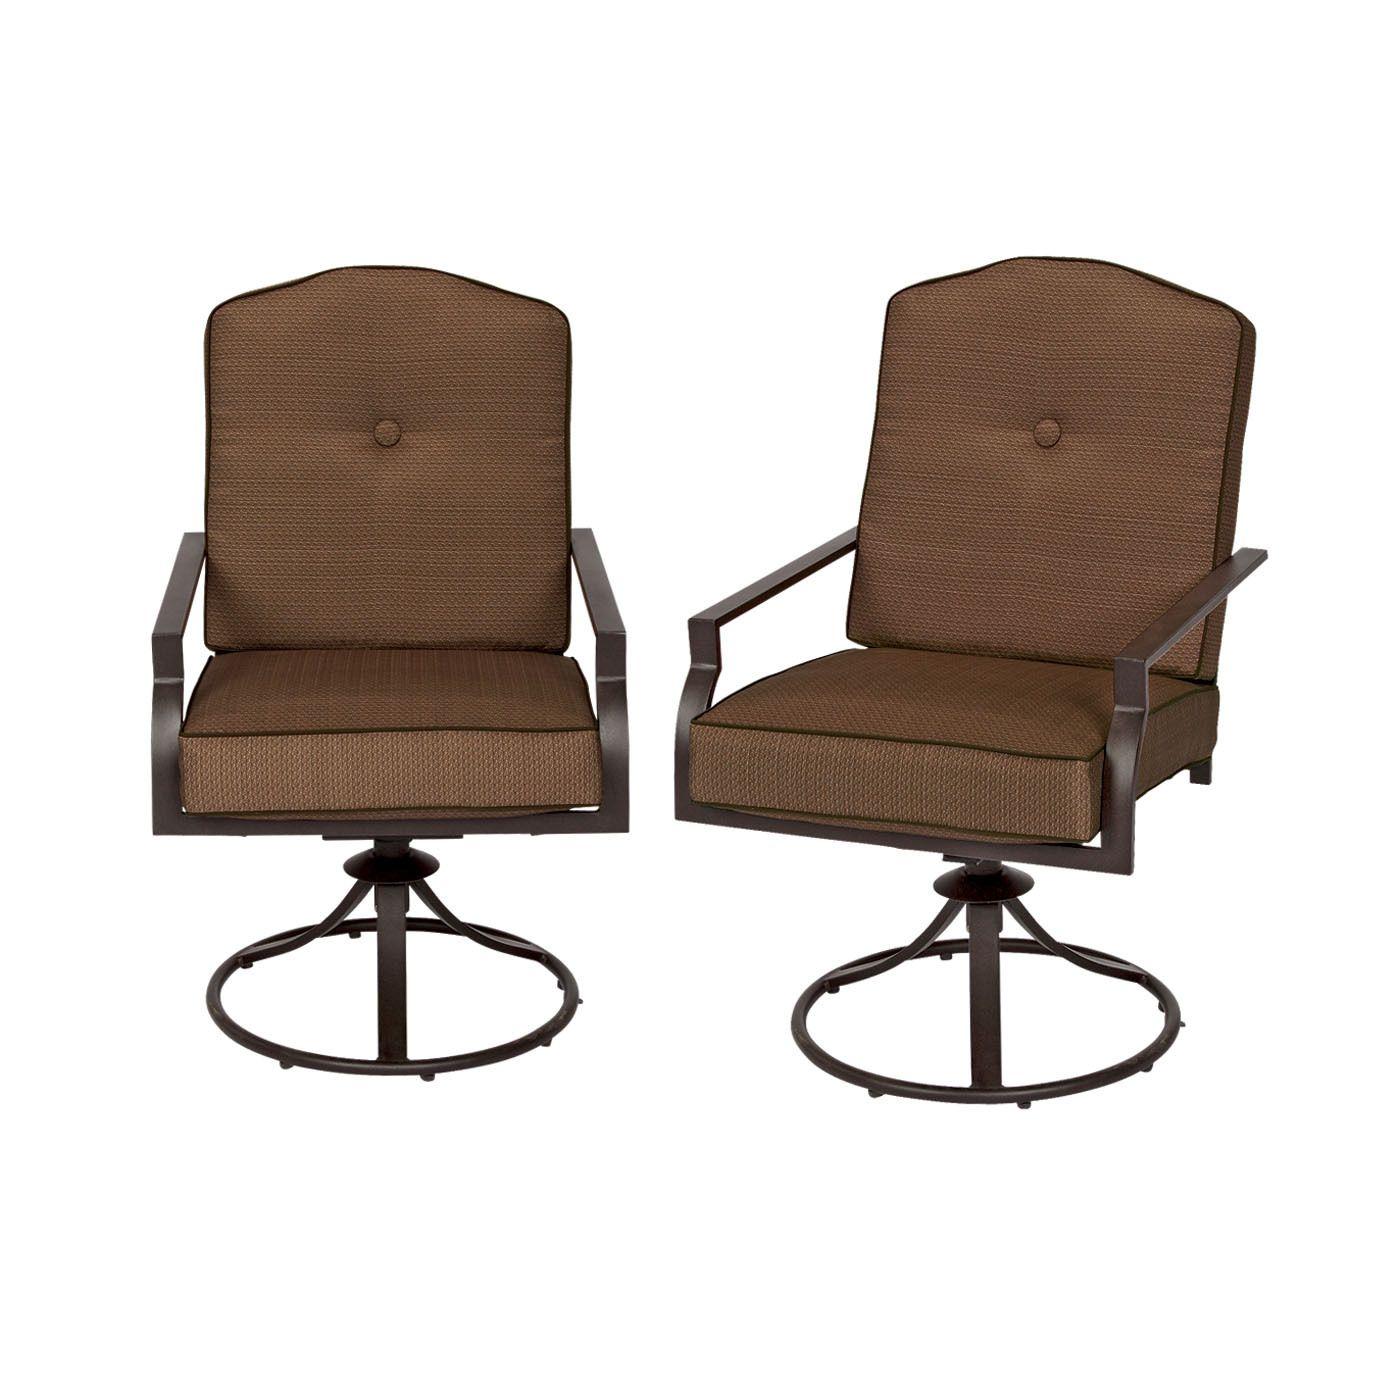 Northcrest Mix And Match York Cushion Swivel Rocker 4pk Shopko Com Patio Cushions Cushions Outdoor Chairs